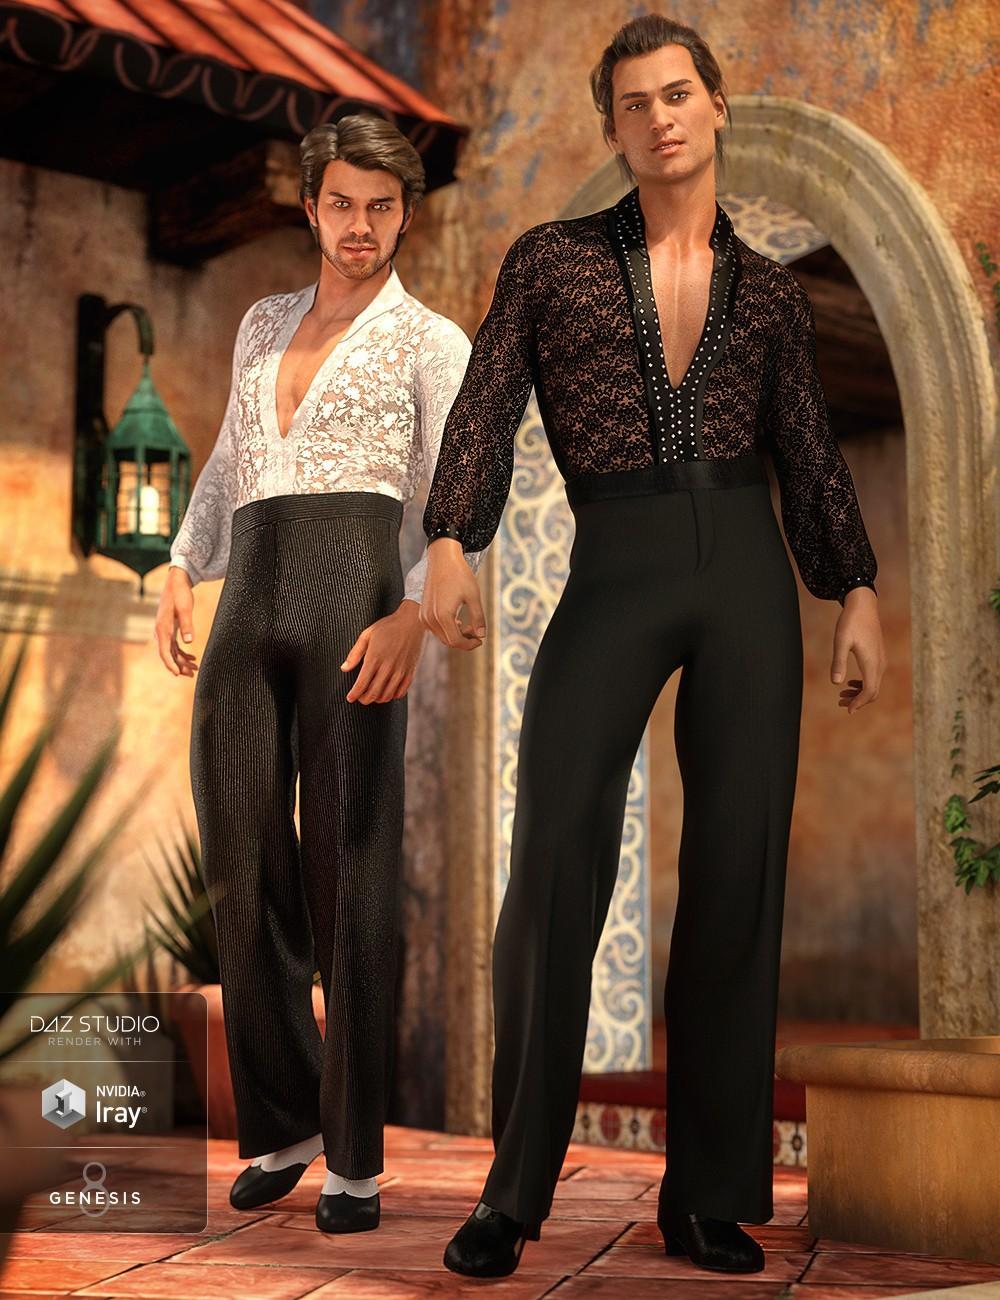 dForce Latin Dancer Outfit Textures